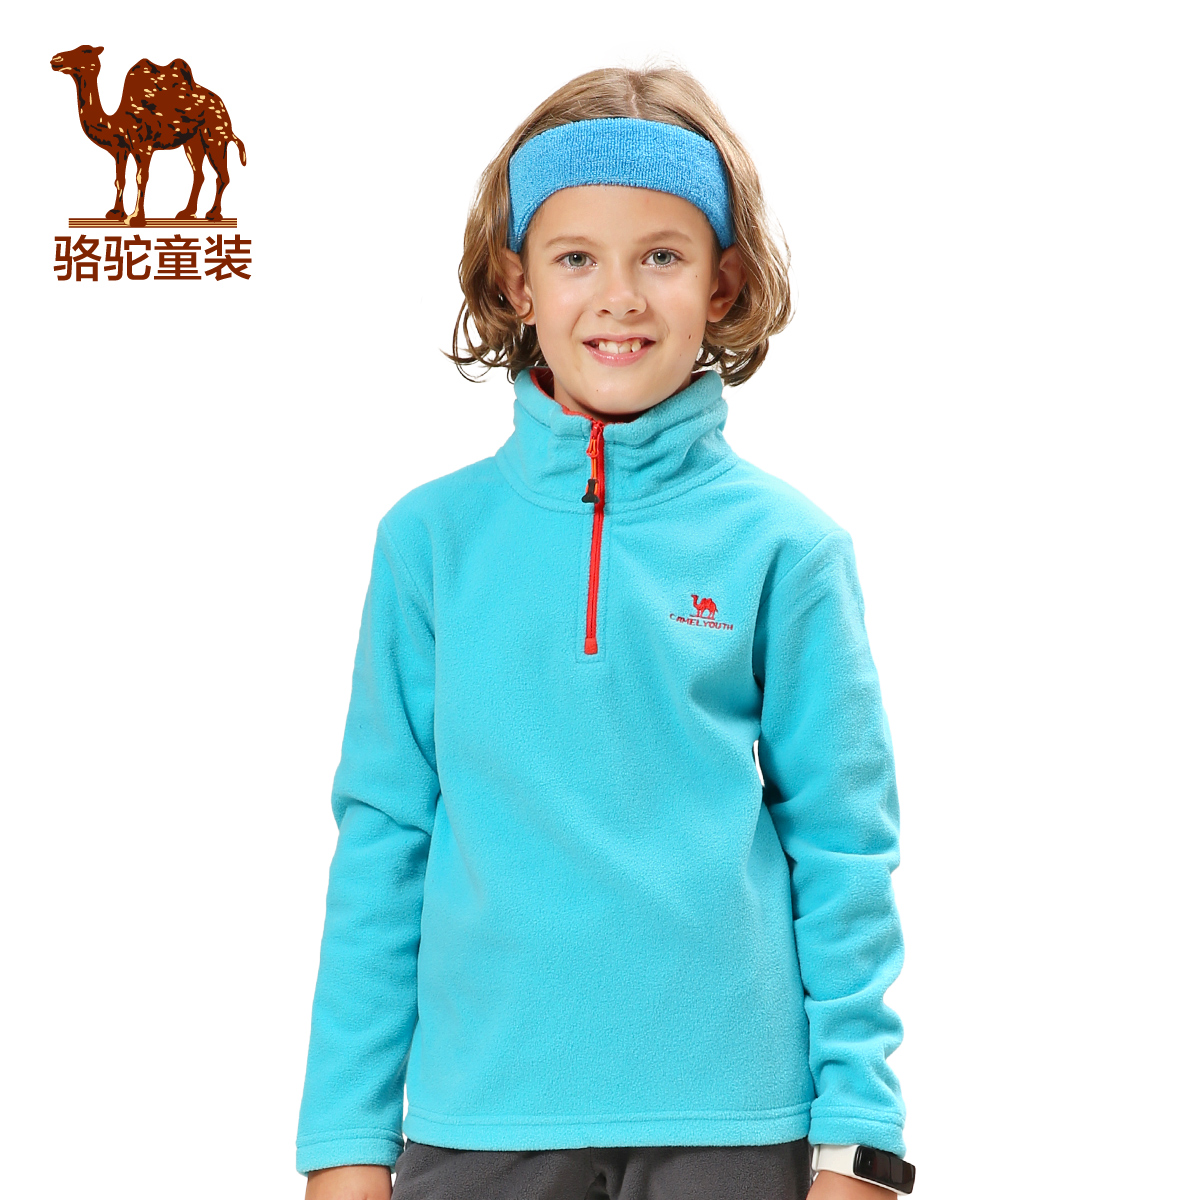 Camel a4w4t7111 1.2